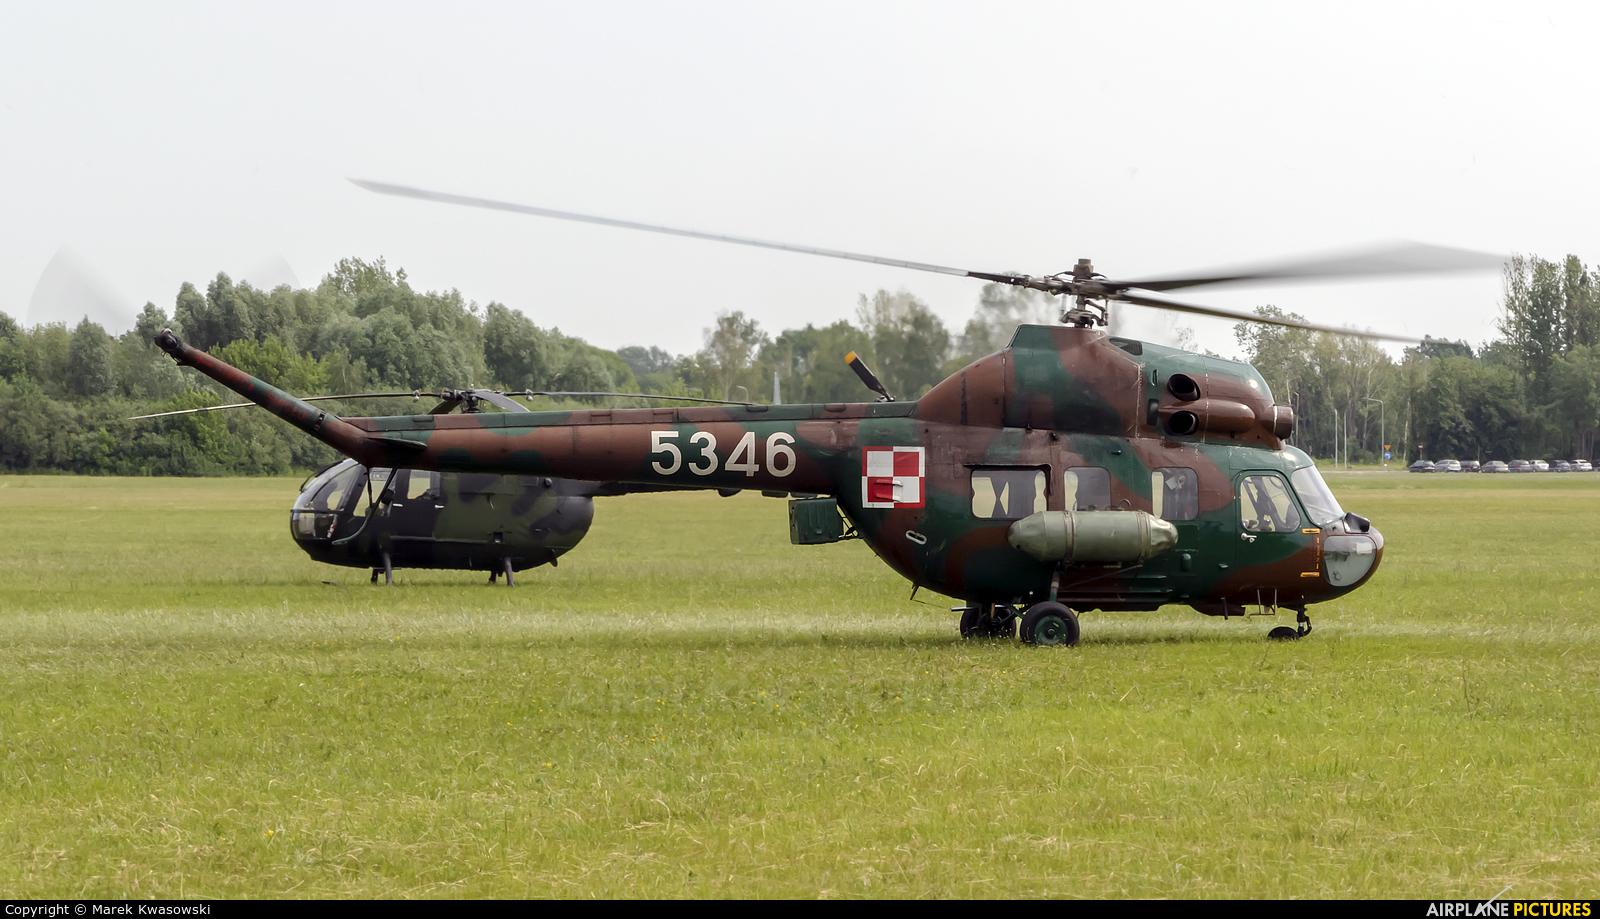 Poland - Army 5346 aircraft at Płock